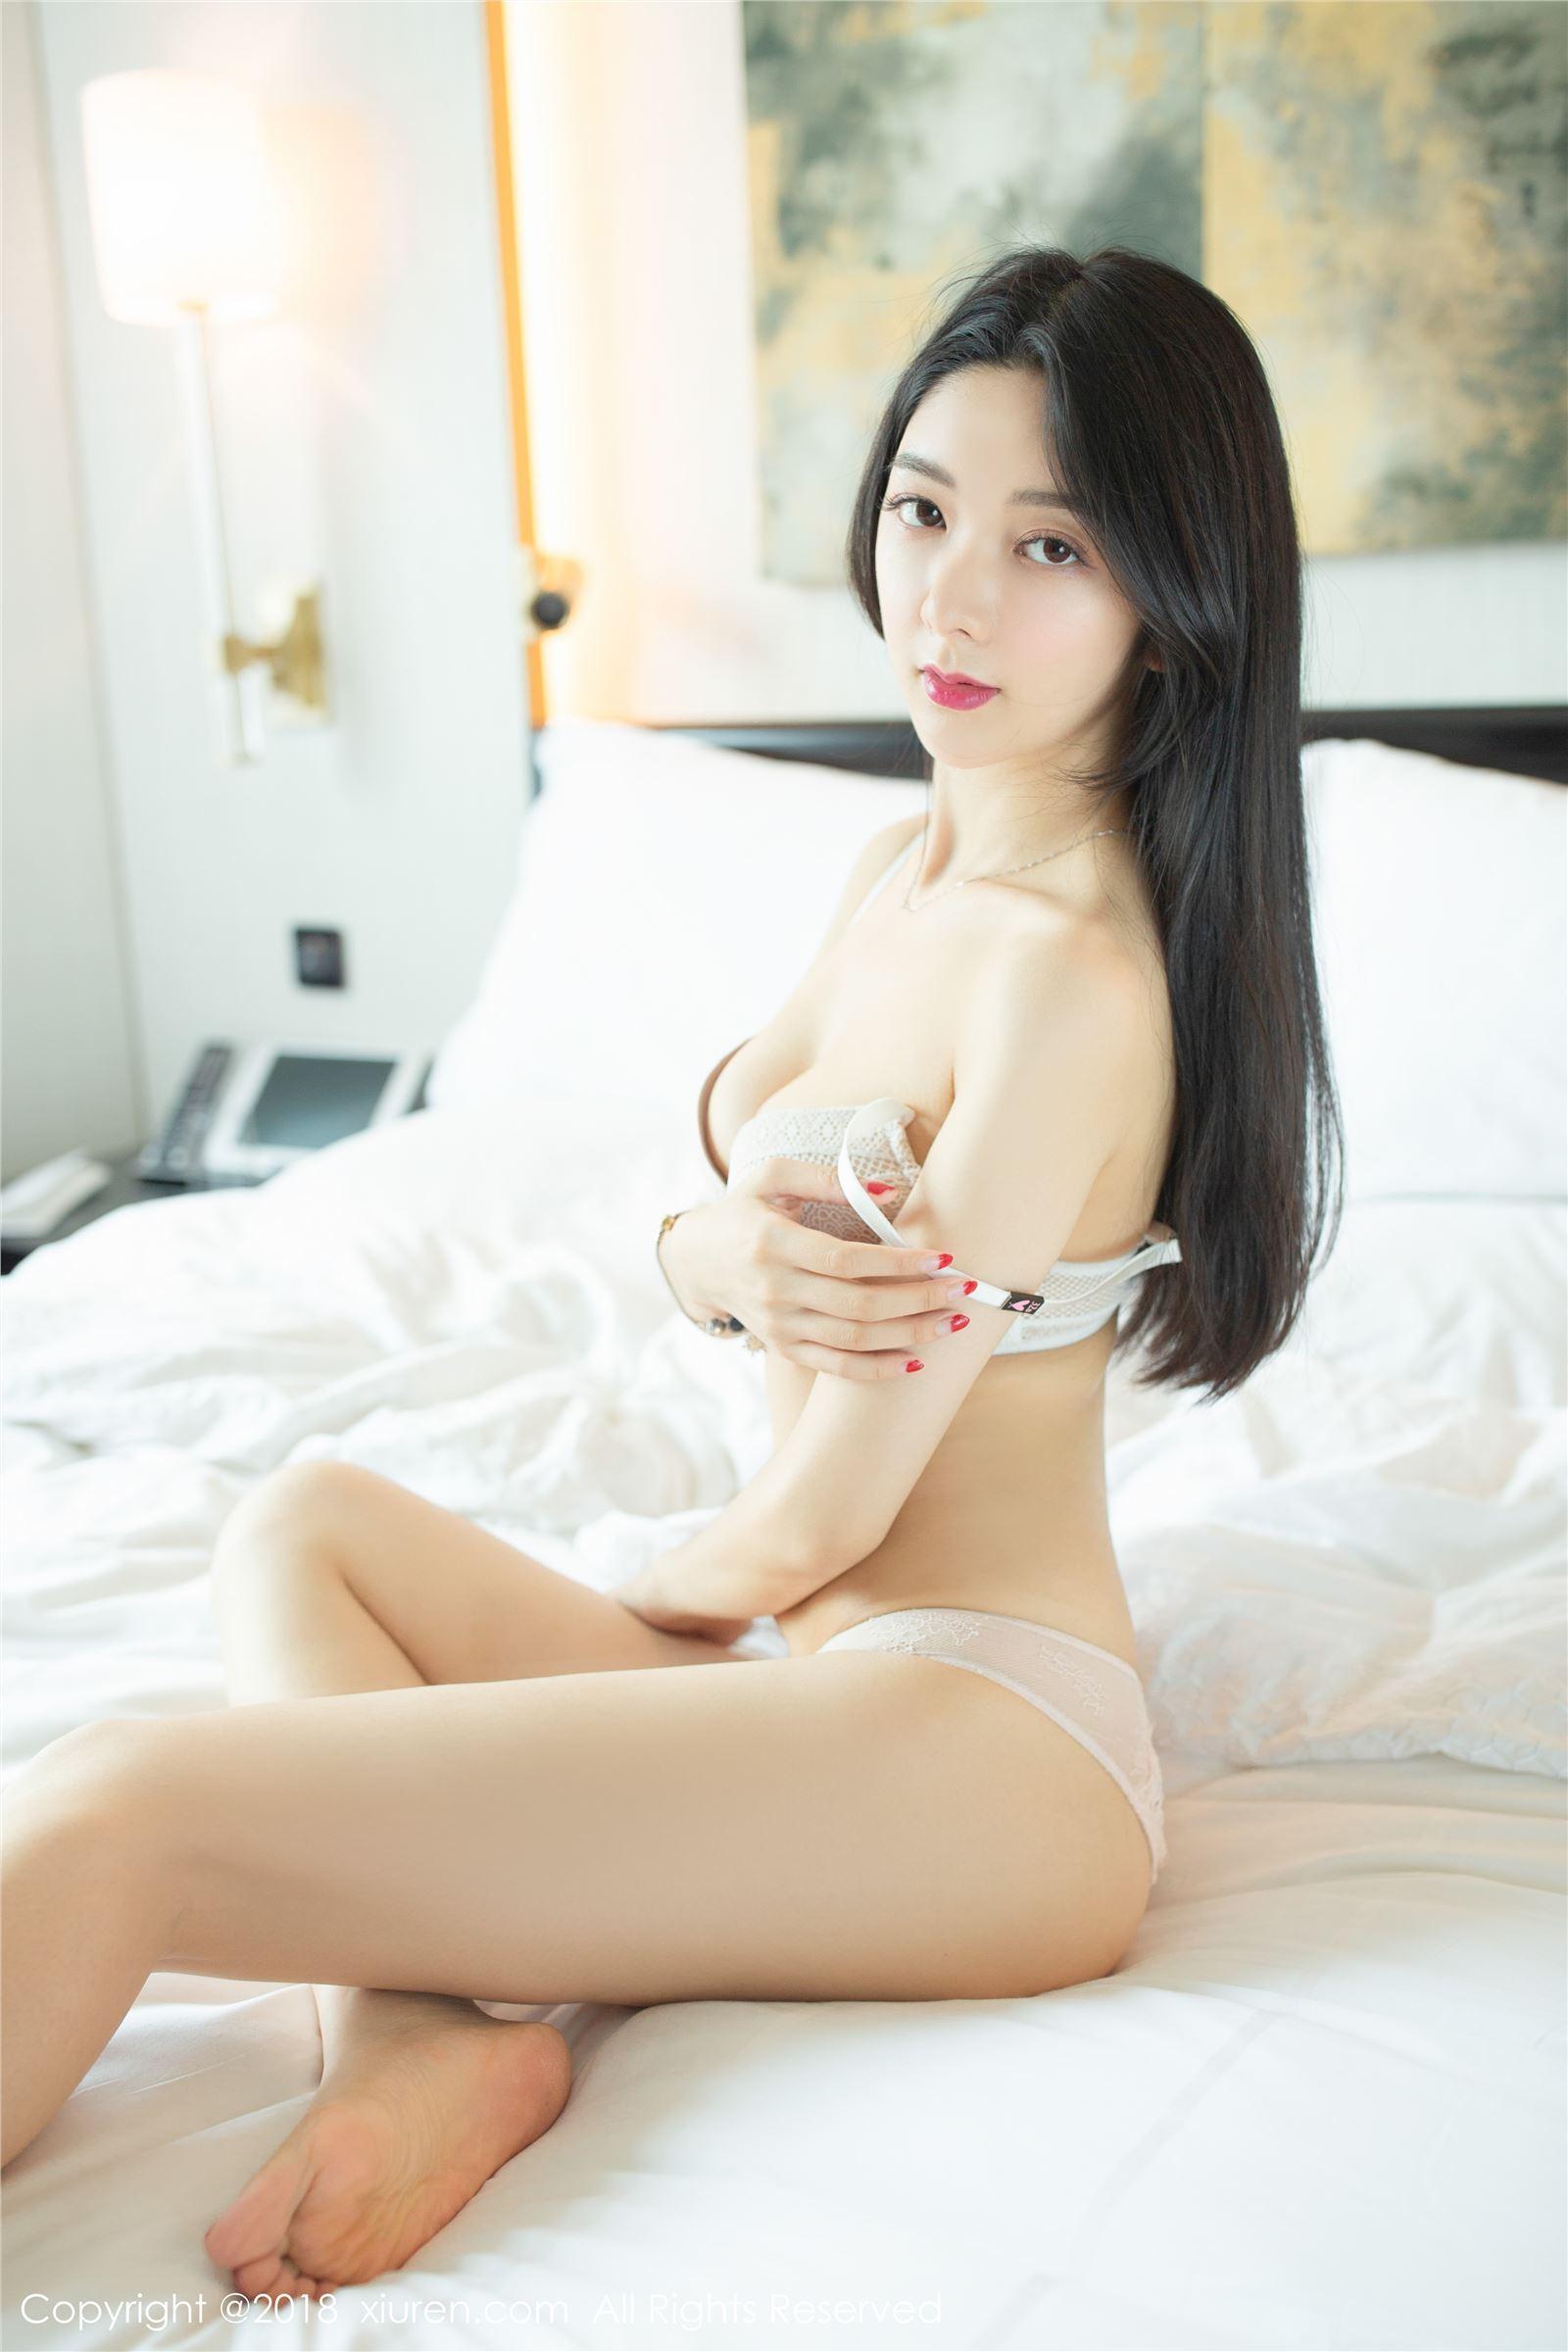 XIUREN秀人网 2018.08.30 No.1141 Angela小热巴